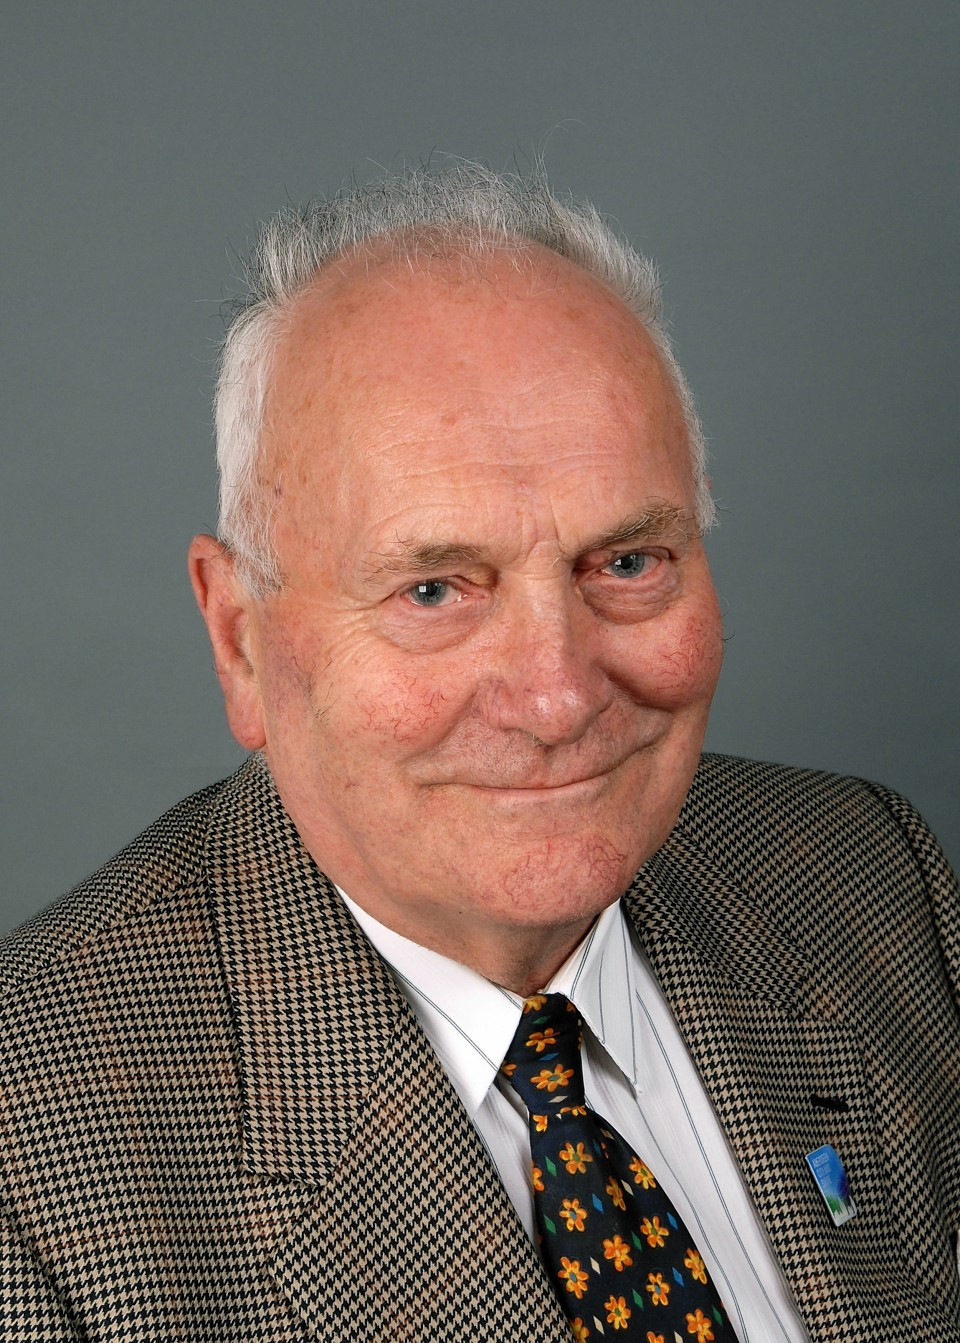 Councillor John Duncan